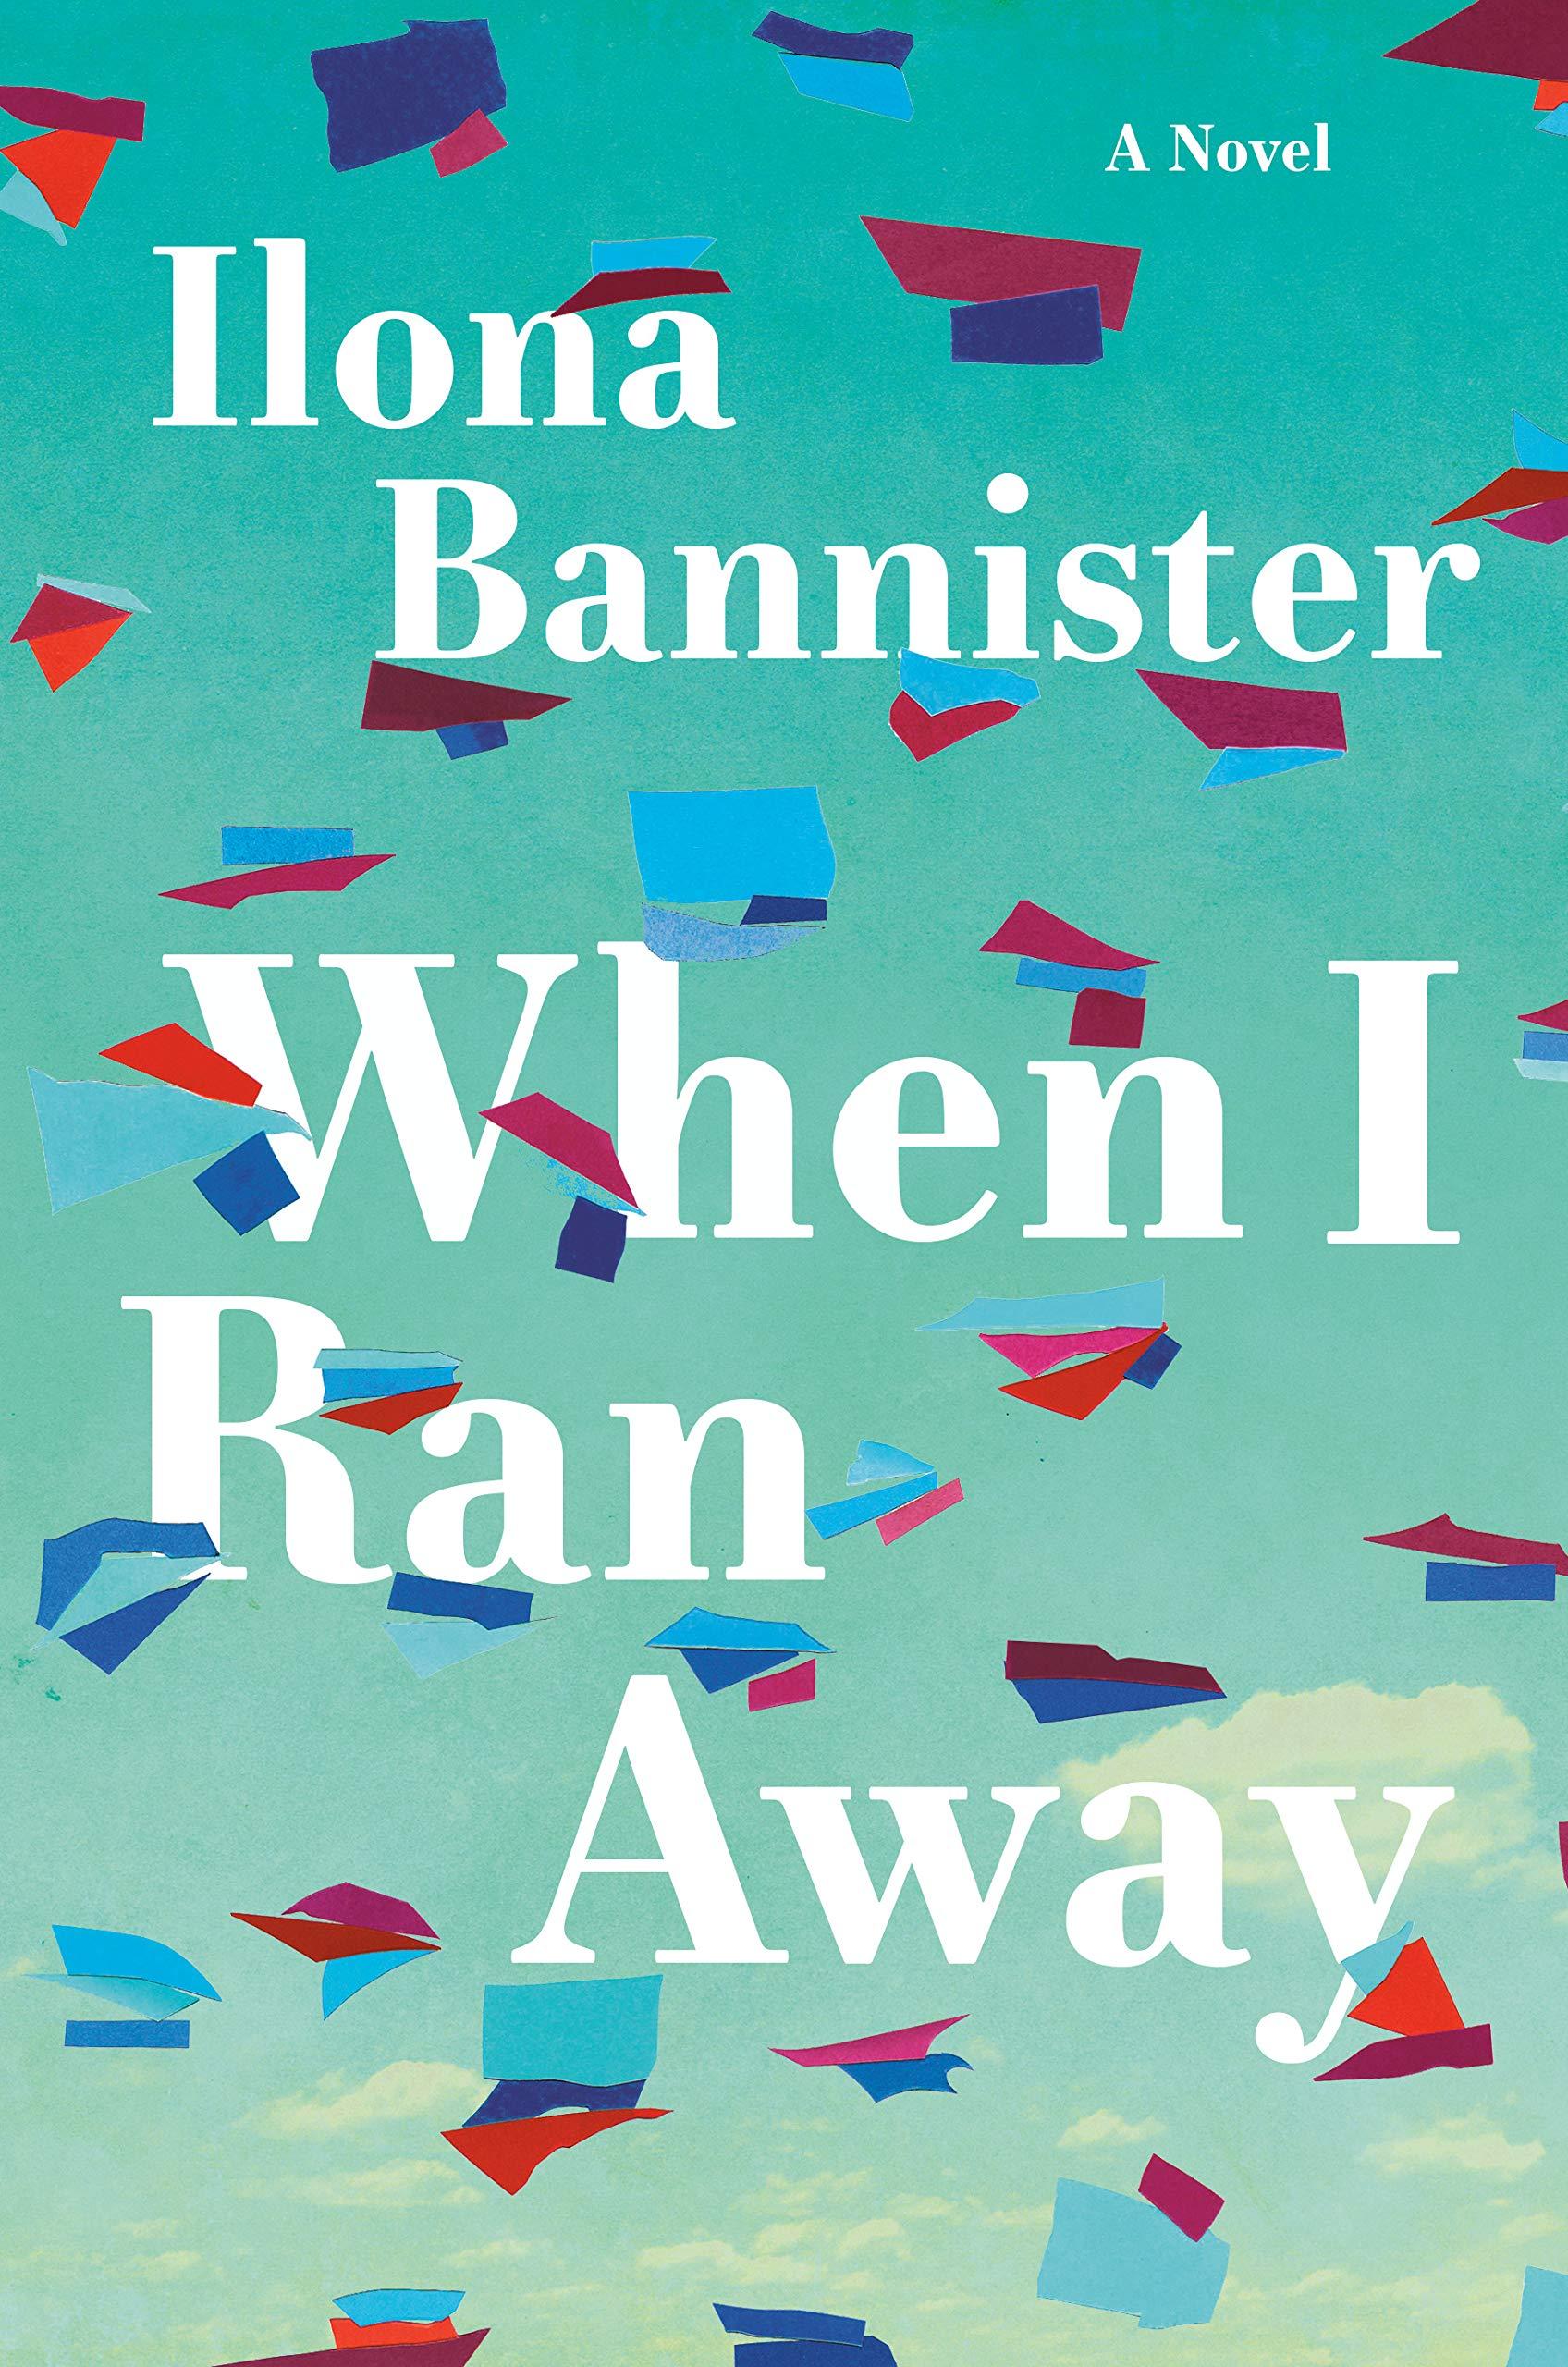 When I Ran Away: A Novel: Bannister, Ilona: 9780385546171: Amazon.com: Books